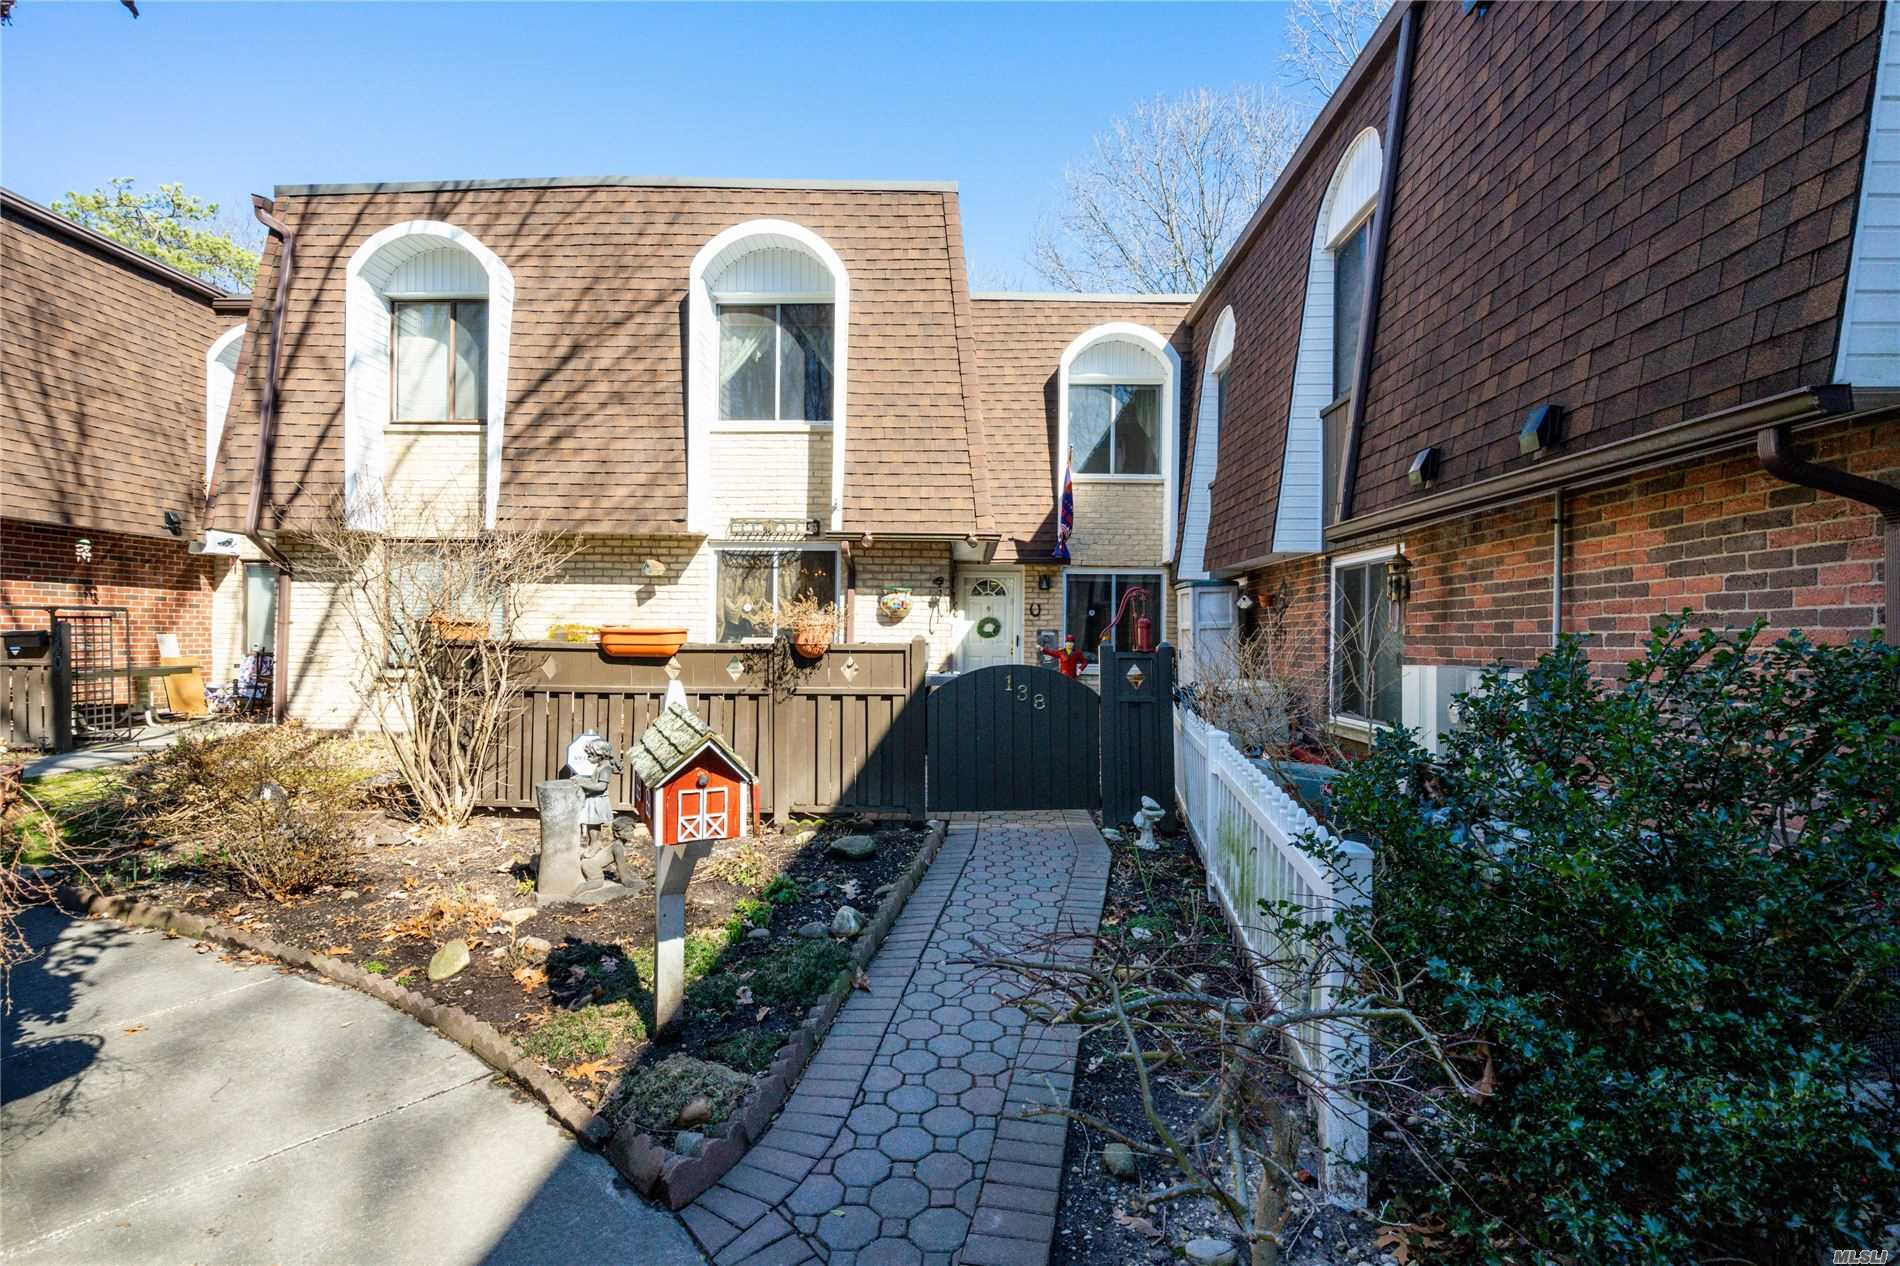 Property for sale at 138 Golf Lane, Medford NY 11763, Medford,  New York 11763